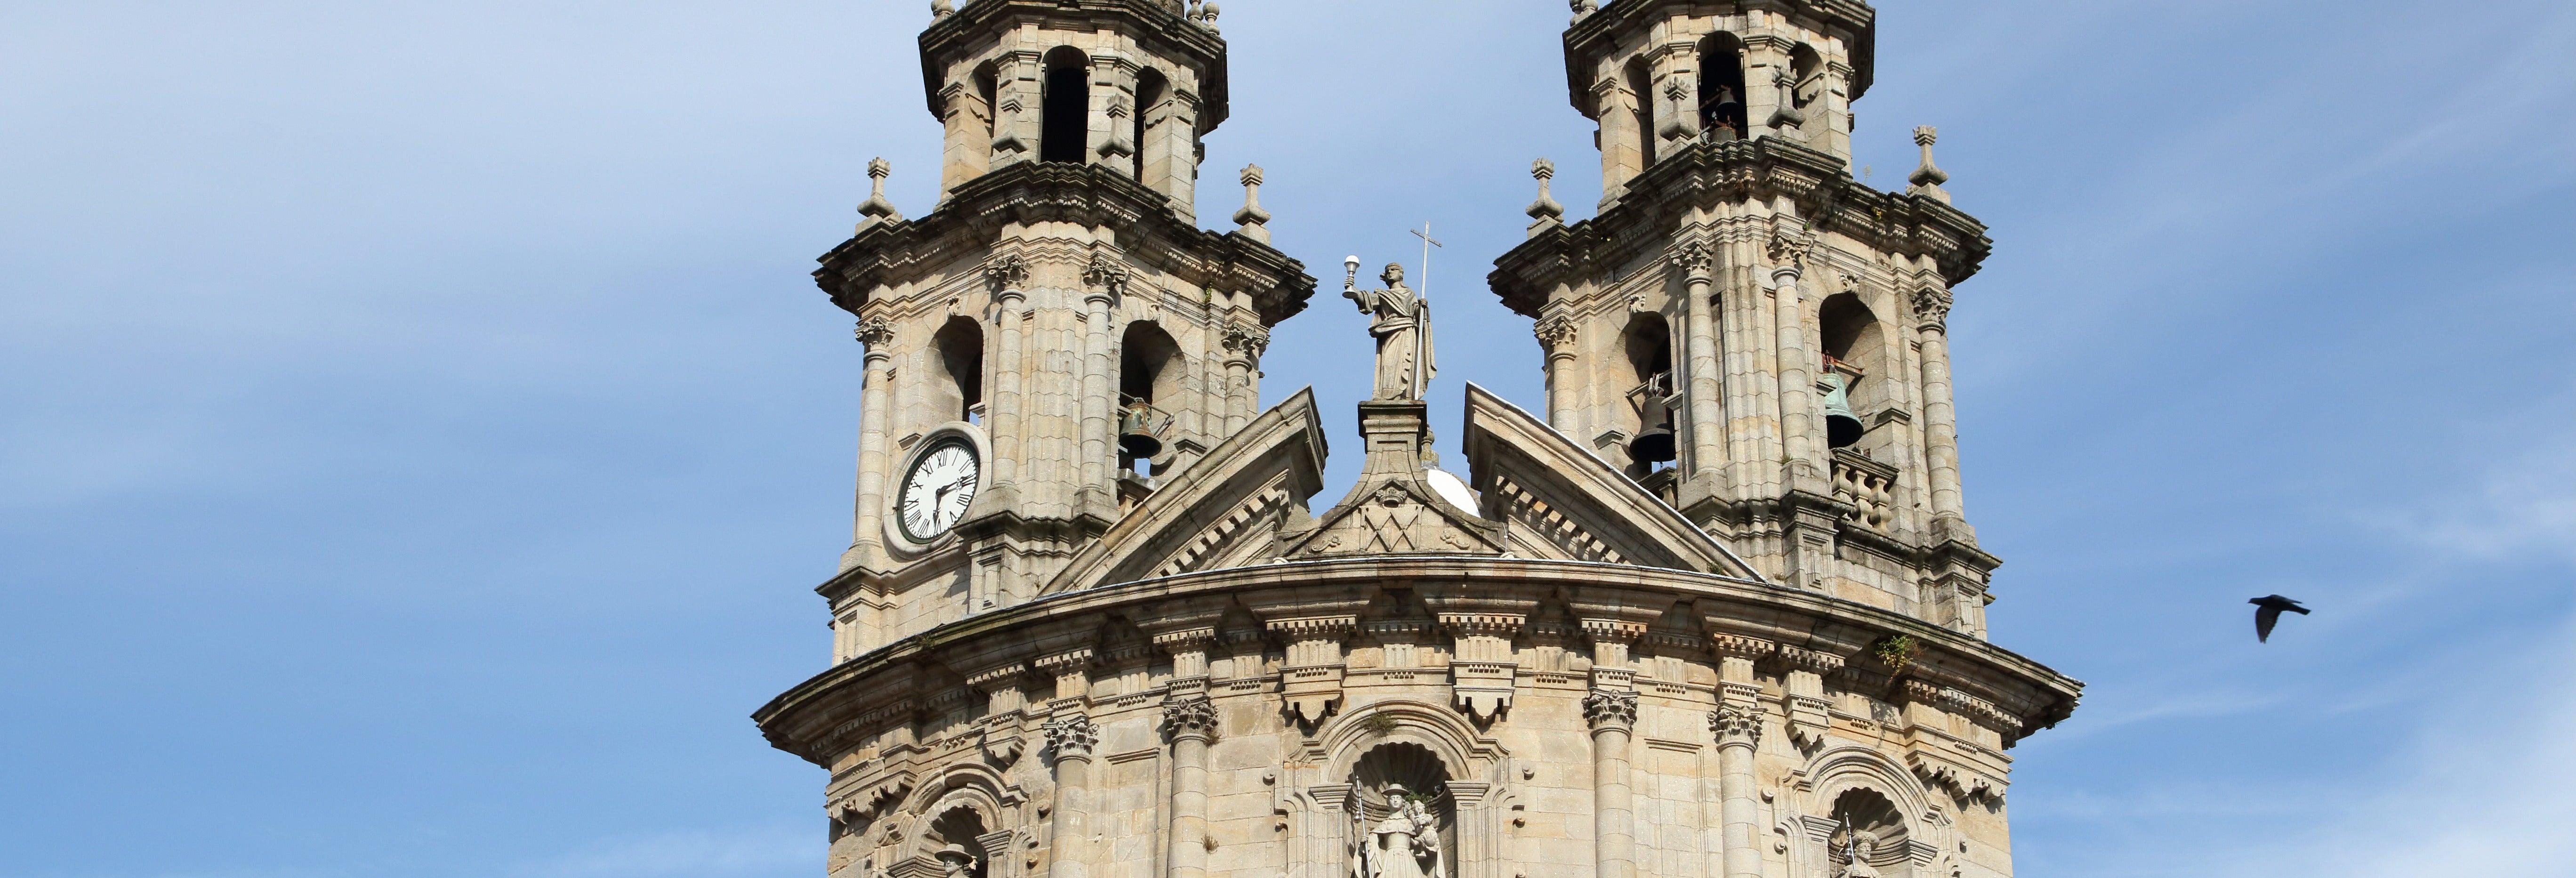 Free tour de misterios y leyendas por Pontevedra ¡Gratis!